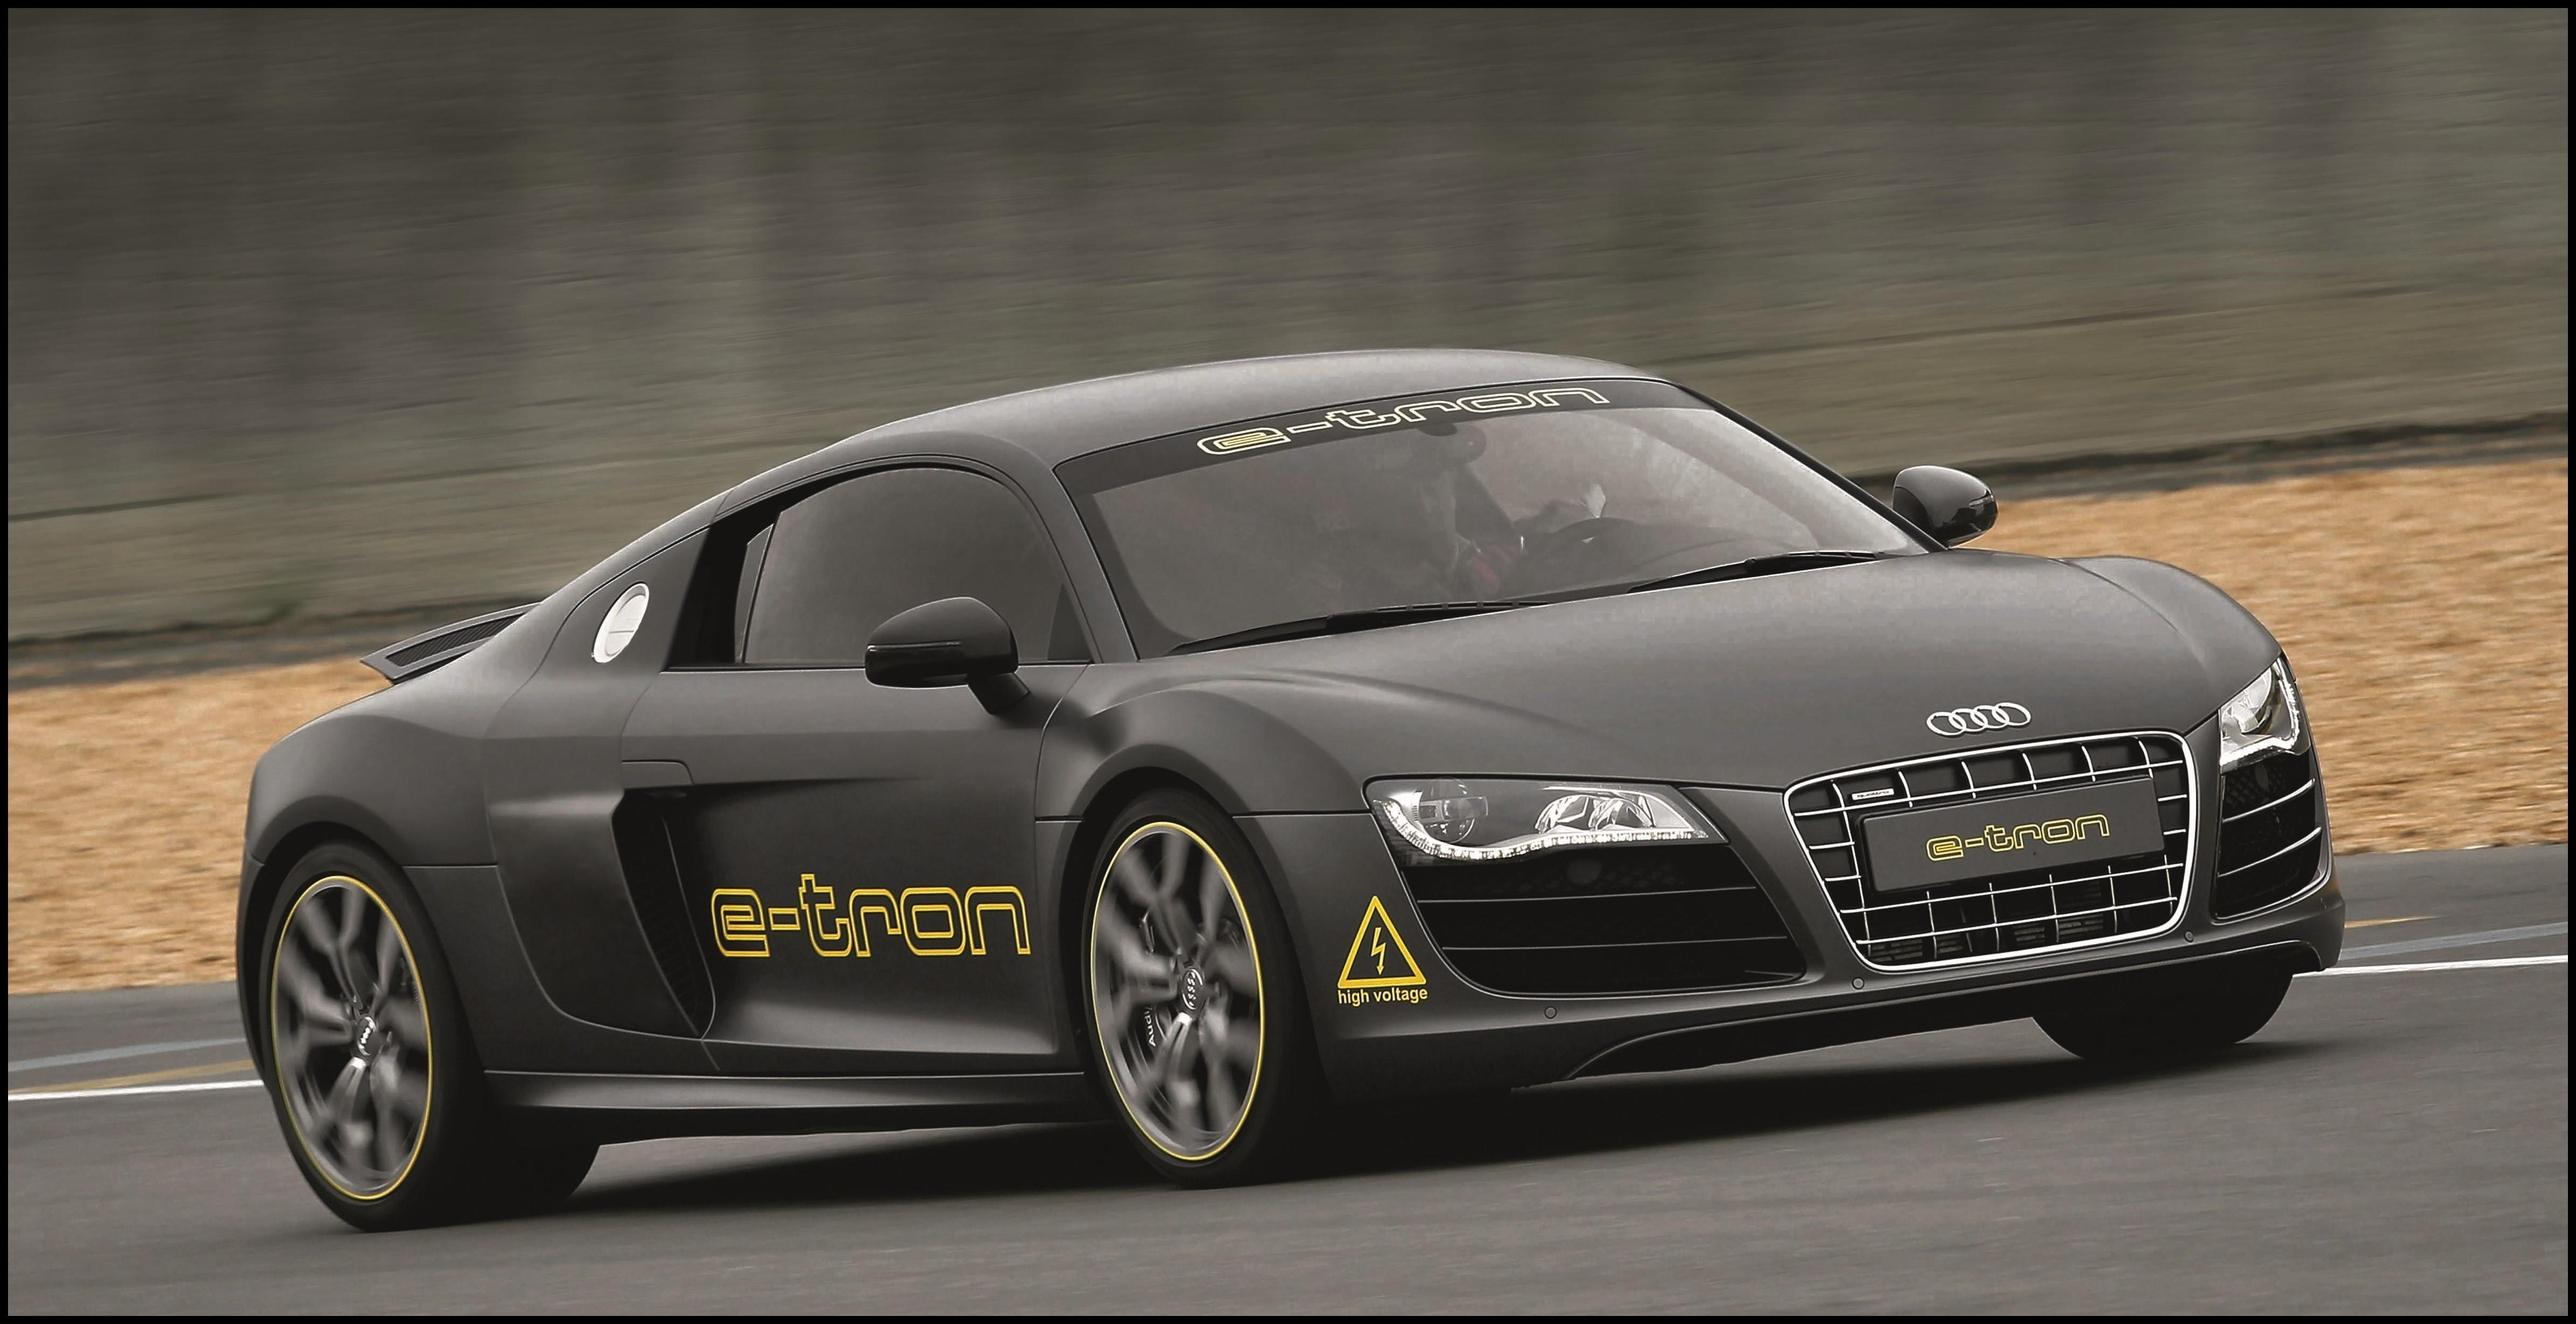 New Latest Model Audi R8 E Tron Gray Car Road Way Wallpapers New Audi Car Wallpaper Price